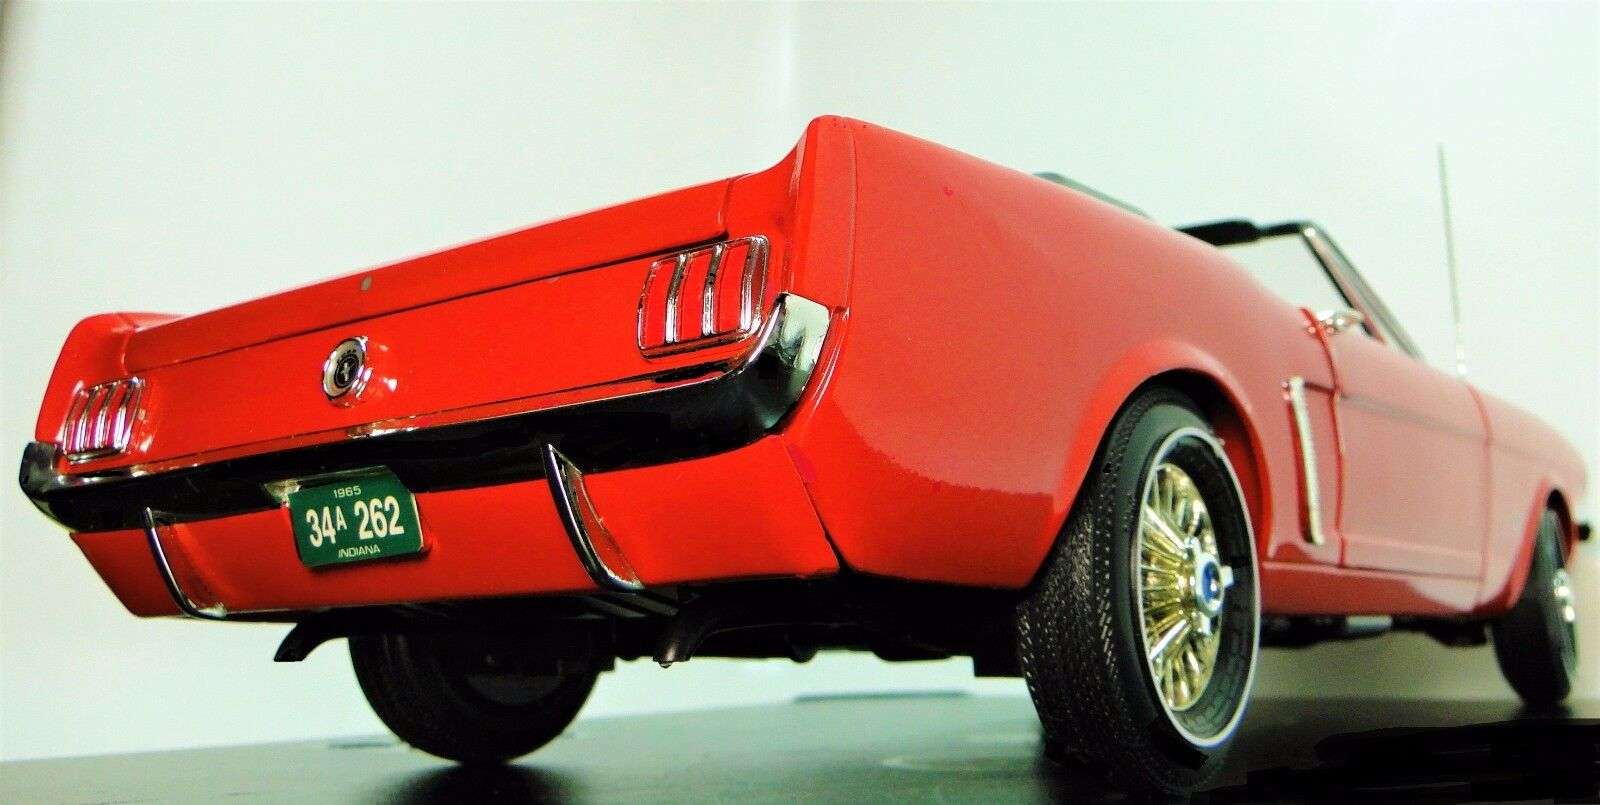 Ford Mustang 15 pulgadas de largo Metal Modelo a 1965 GT 1 T Race Sport Car Vintage 40